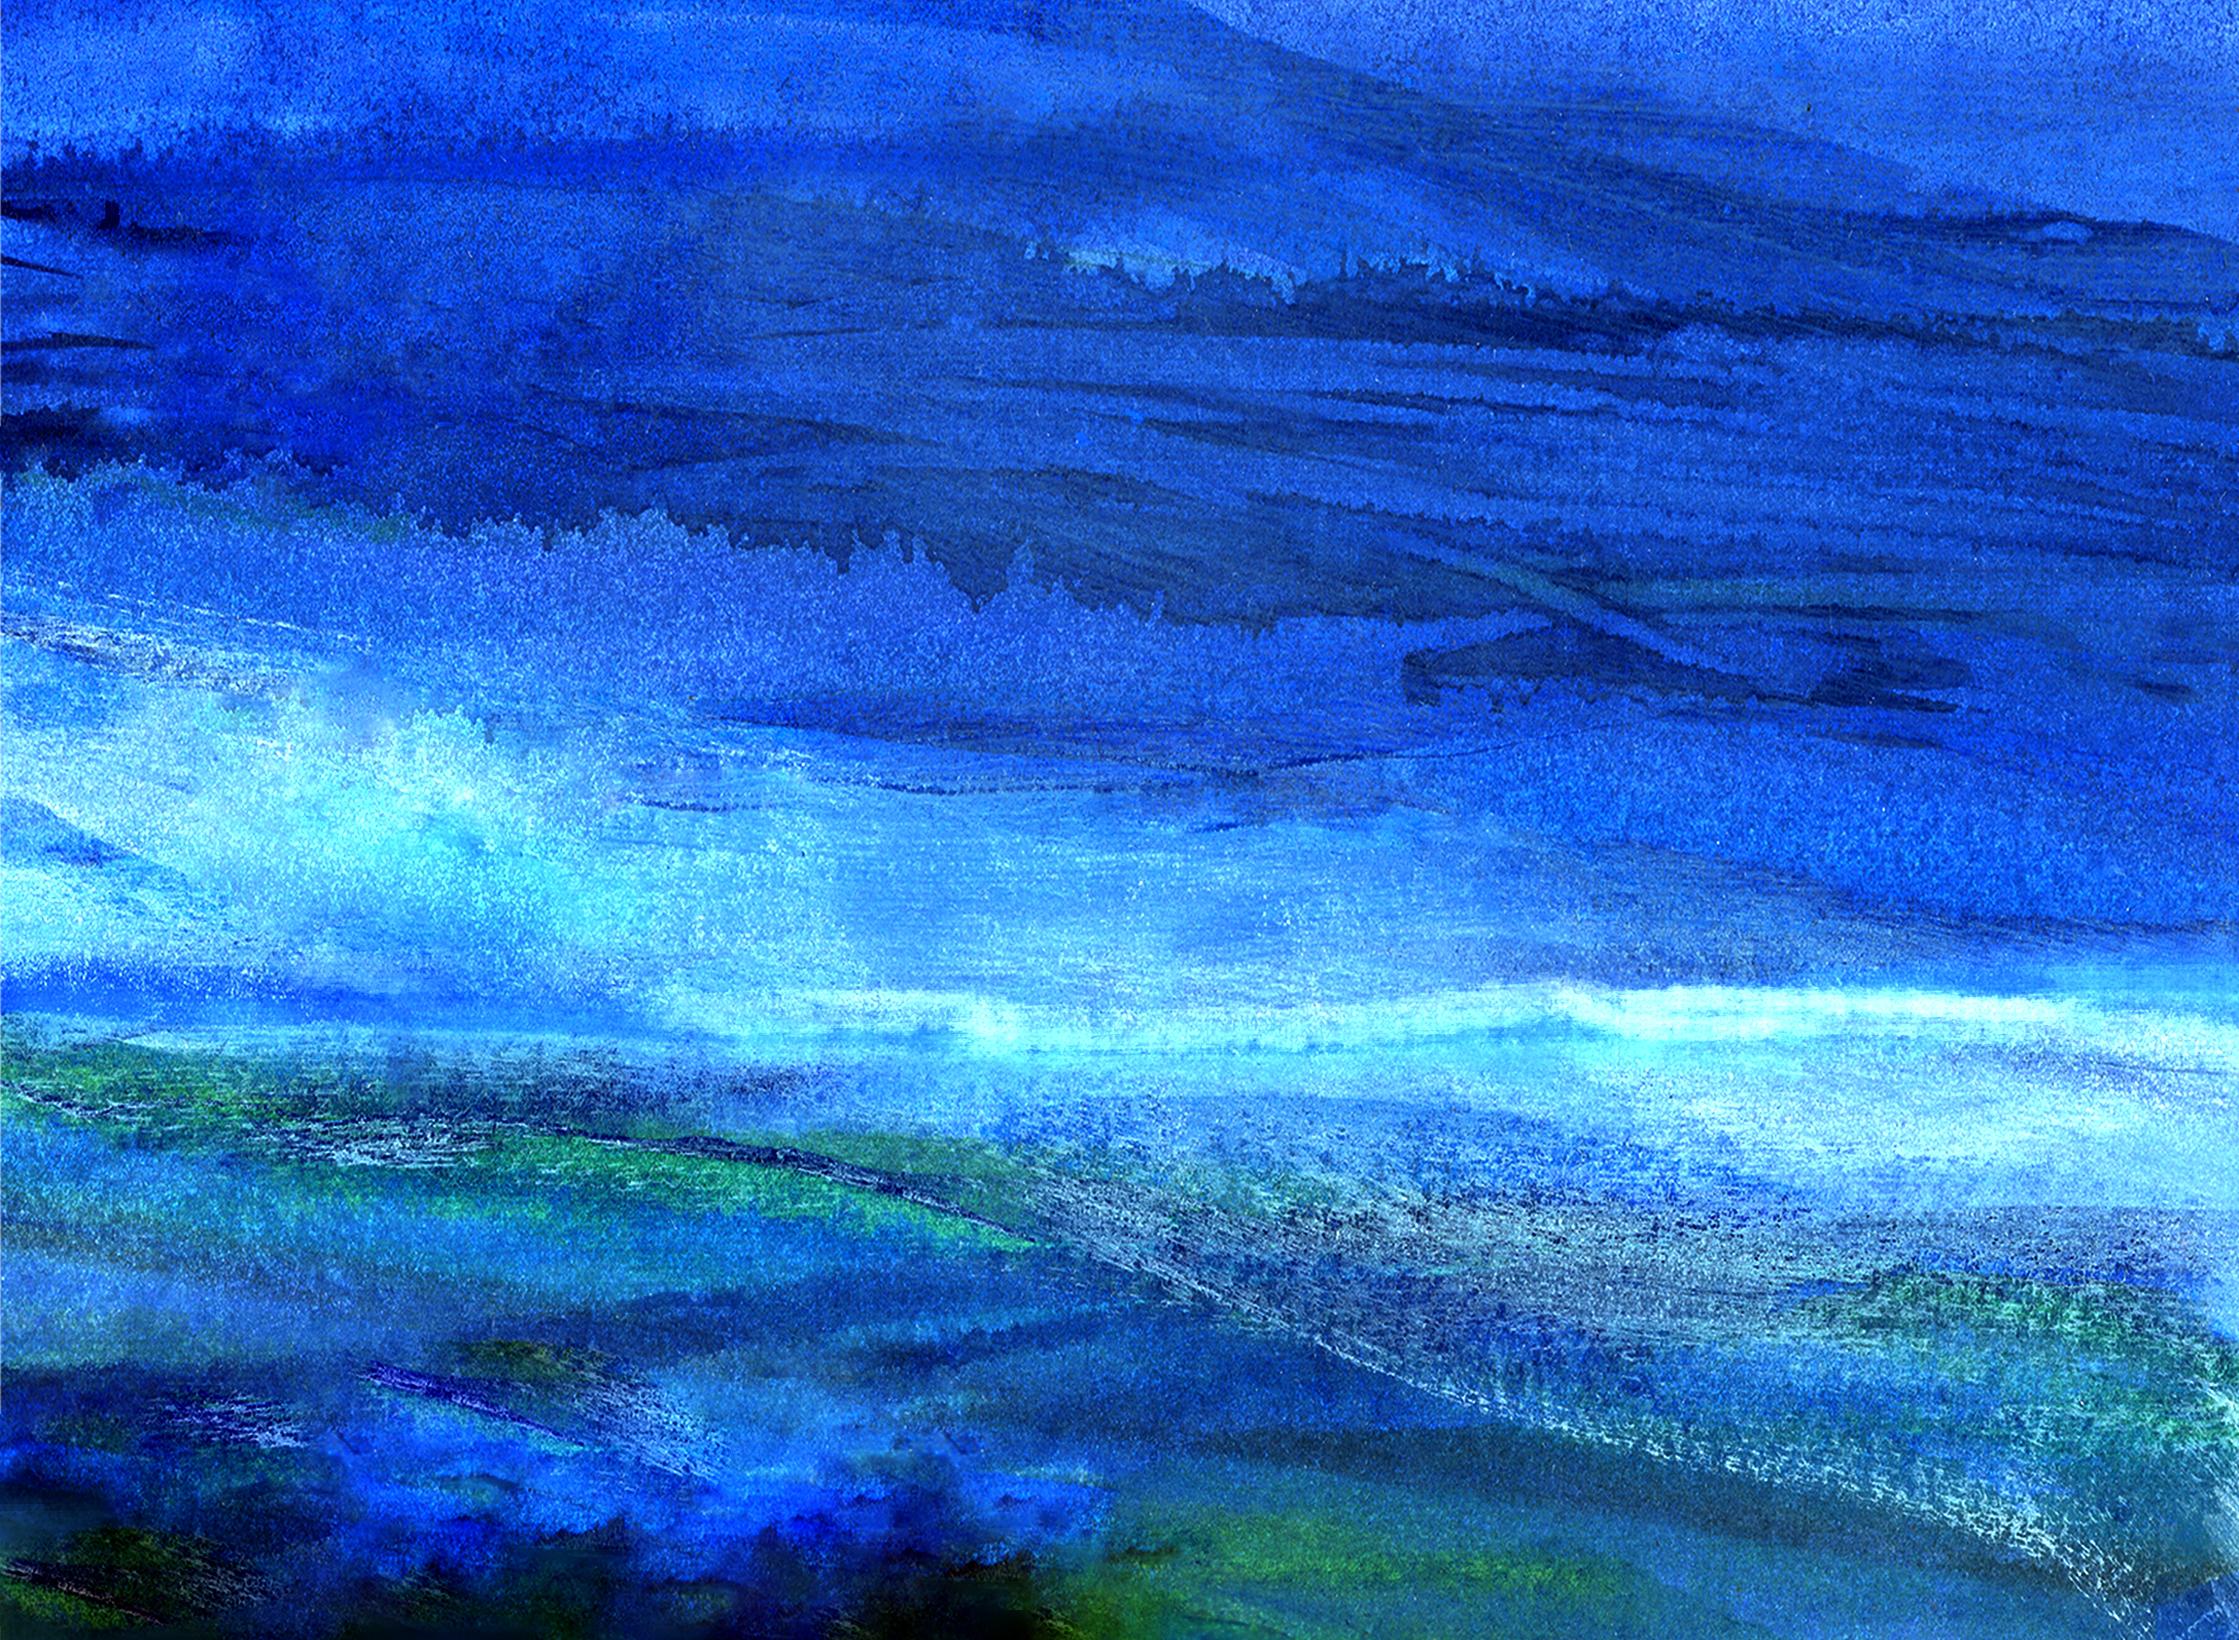 RHYTHM IN BLUES, Watercolour, 18x20